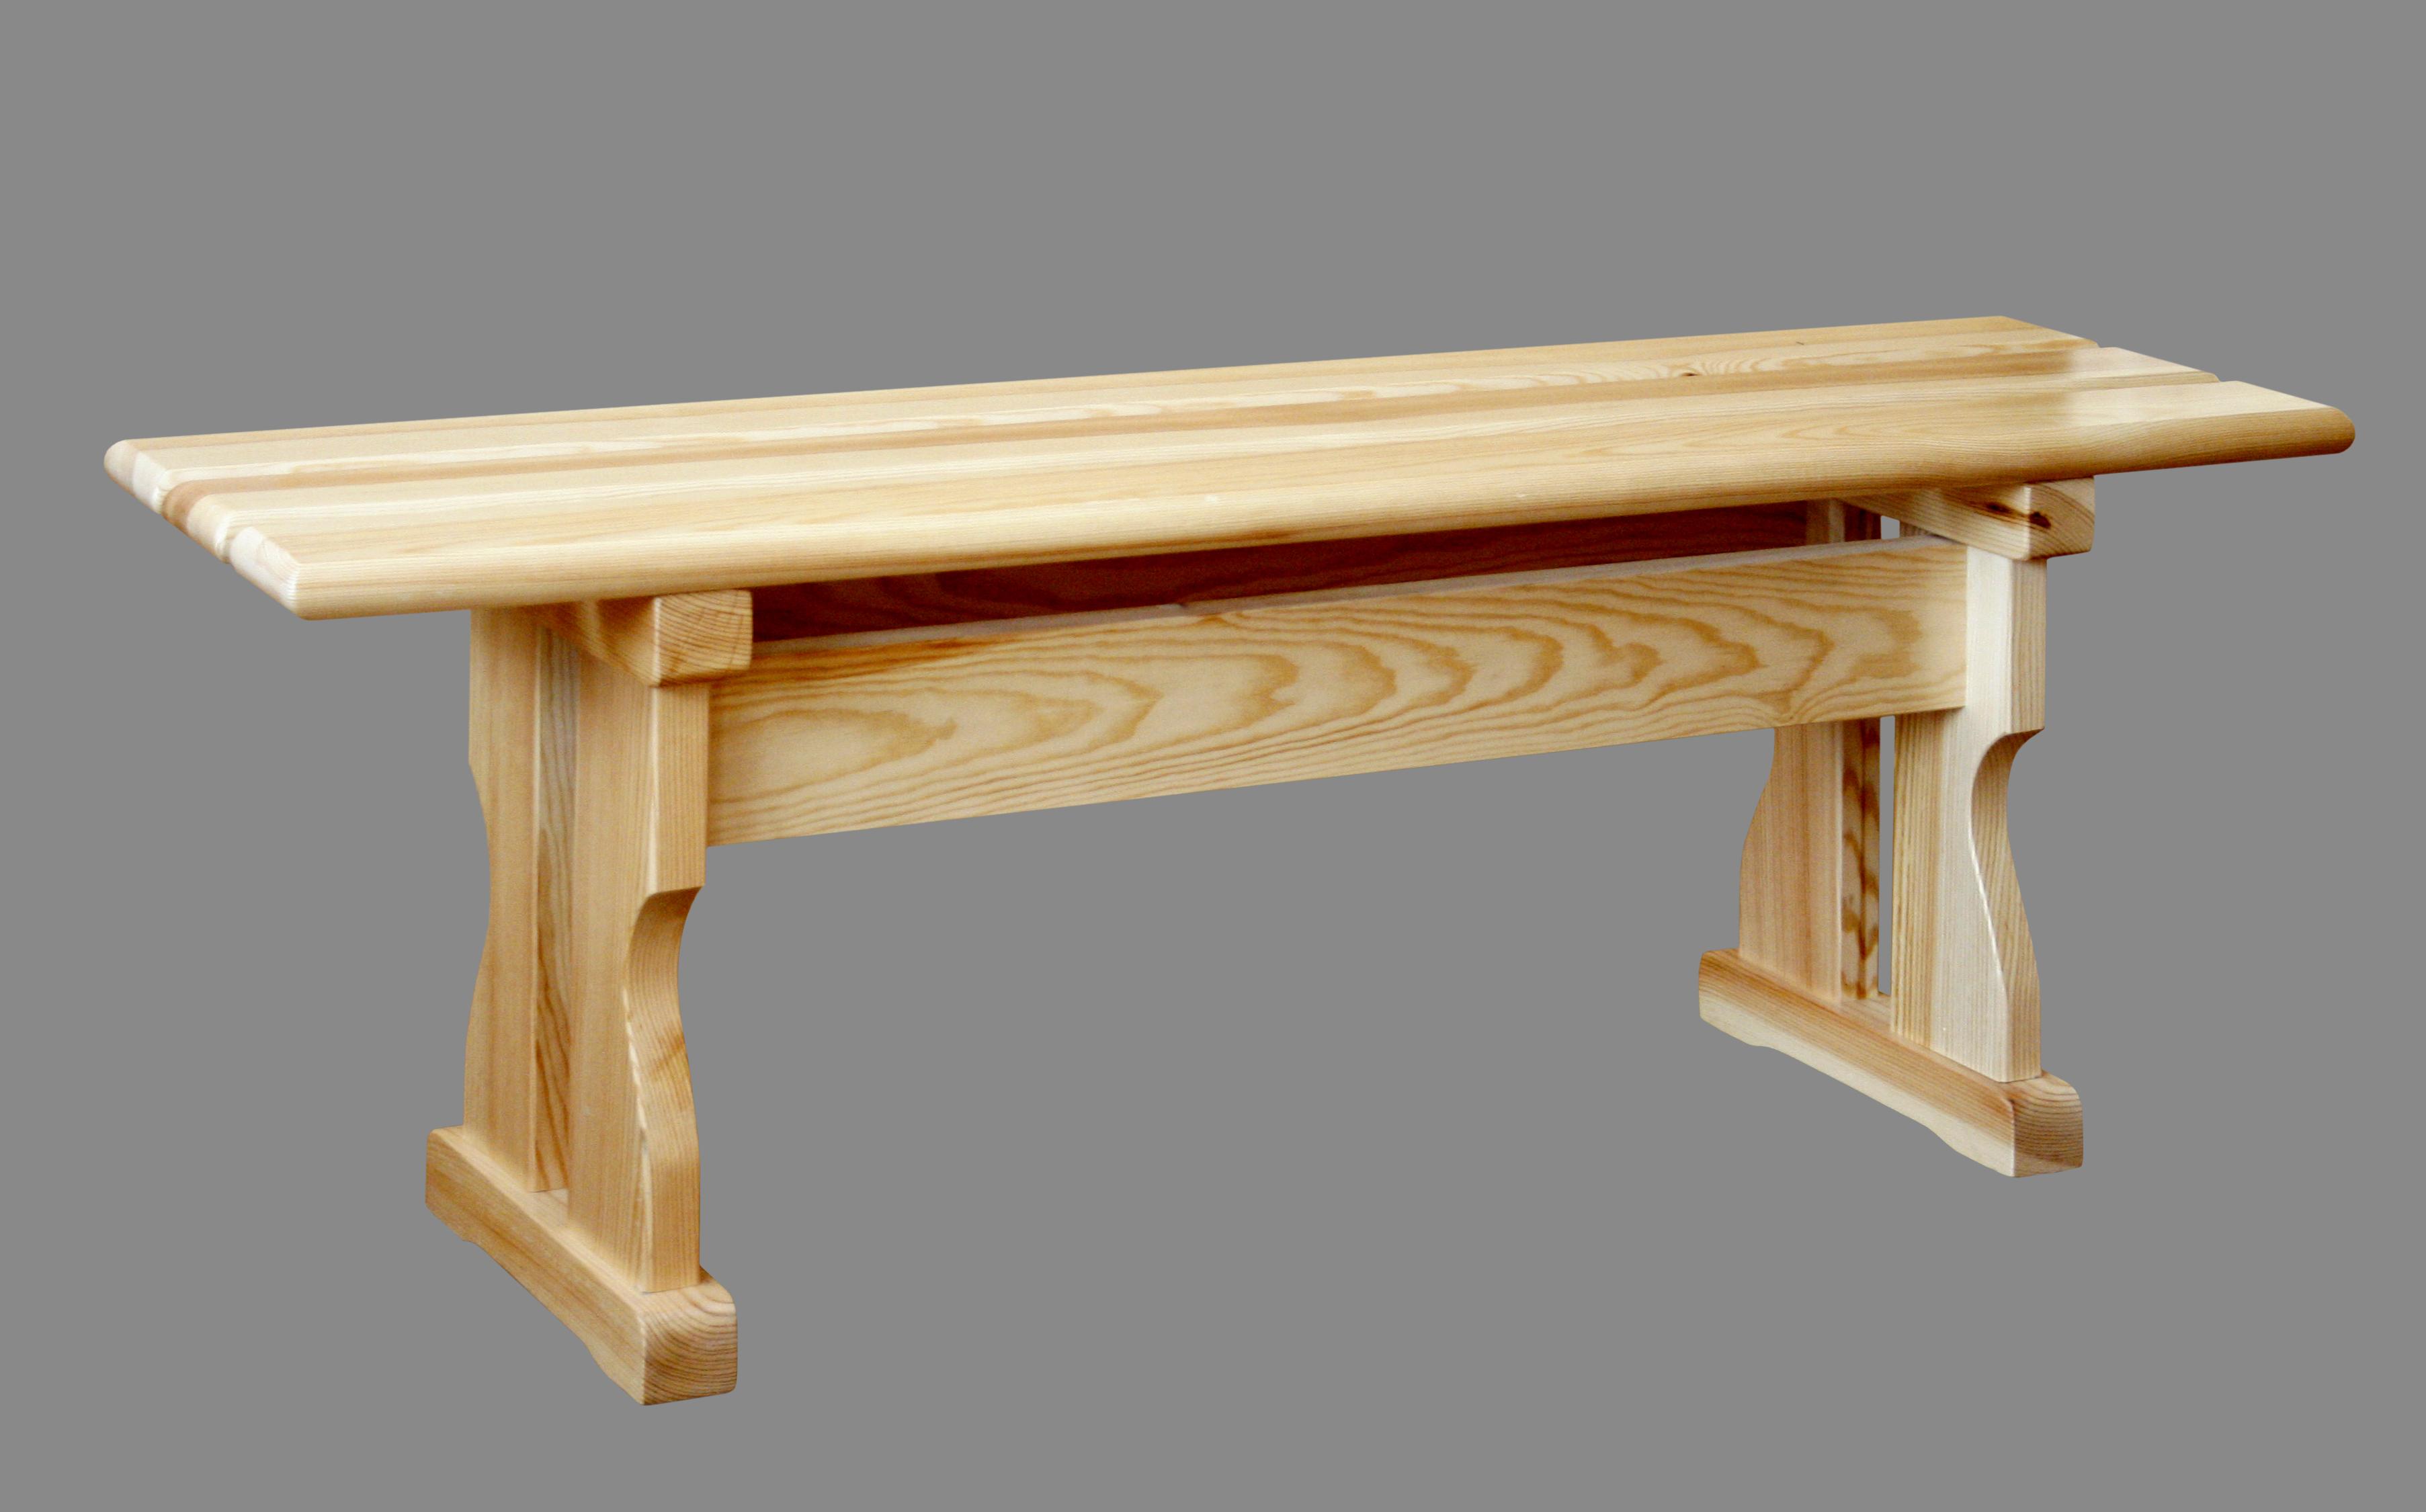 Деревянная скамейка без спинки своими руками